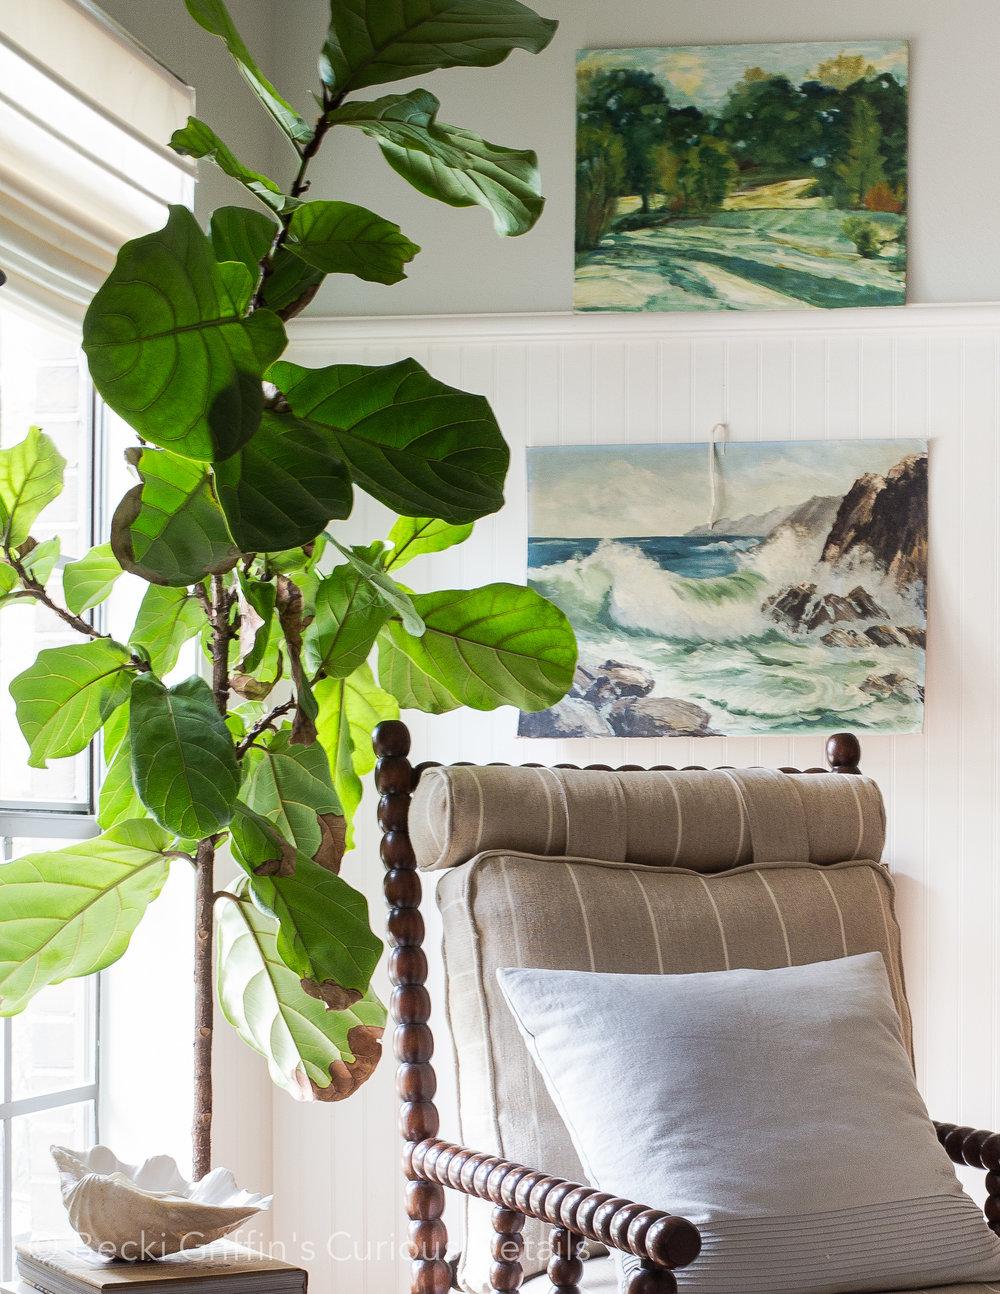 Becki Griffin's Curious Details-Art Corner